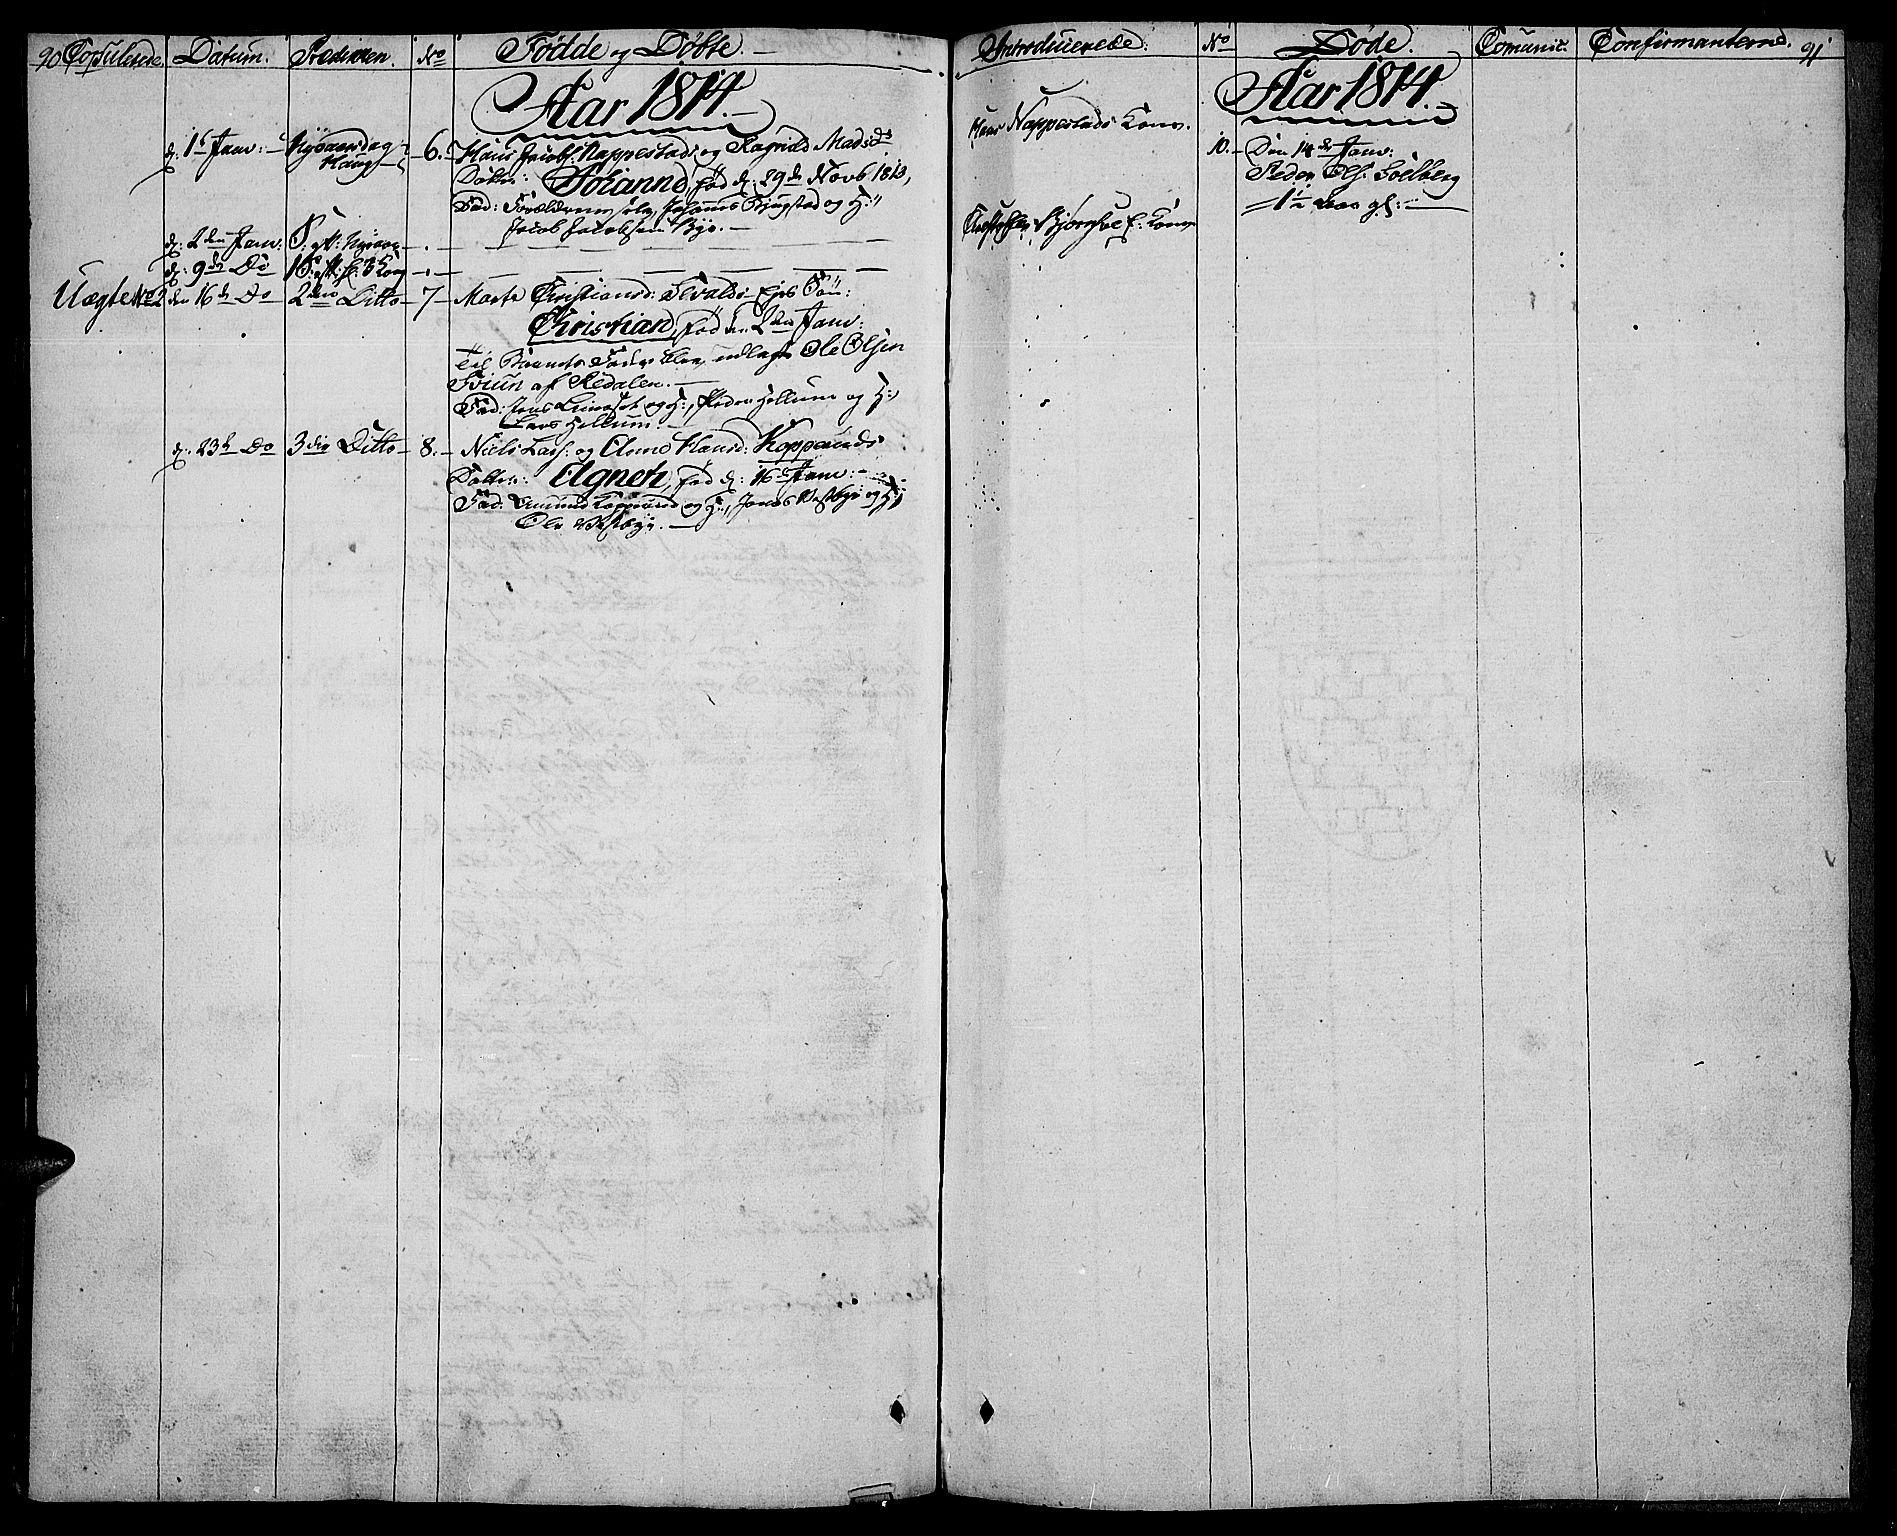 SAH, Vardal prestekontor, H/Ha/Haa/L0003: Ministerialbok nr. 3, 1808-1814, s. 90-91